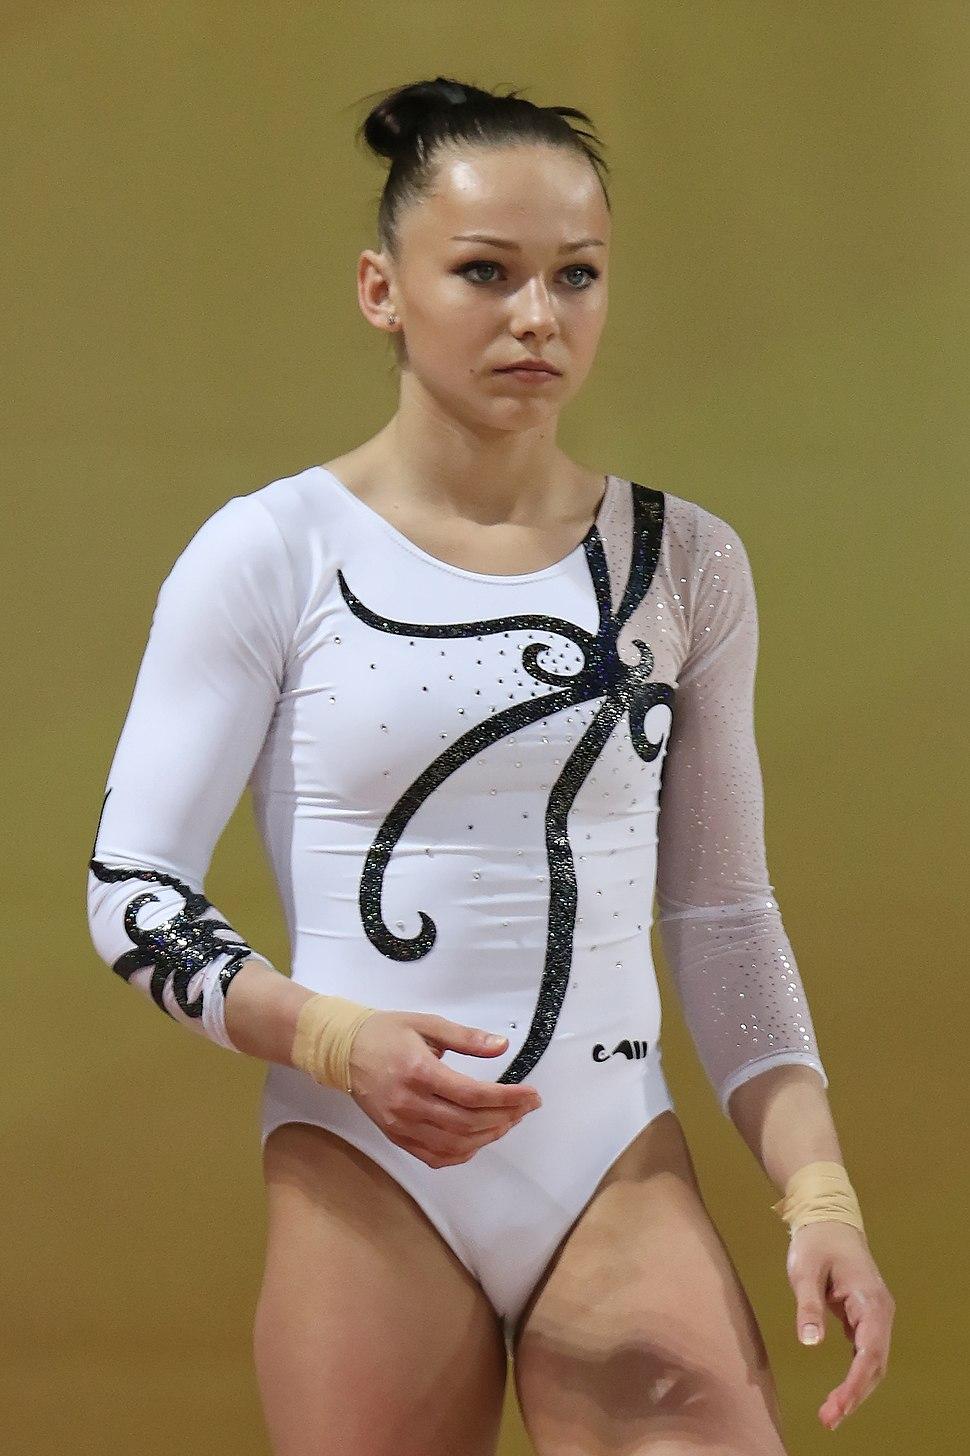 2015 European Artistic Gymnastics Championships - Vault - Maria Paseka 01